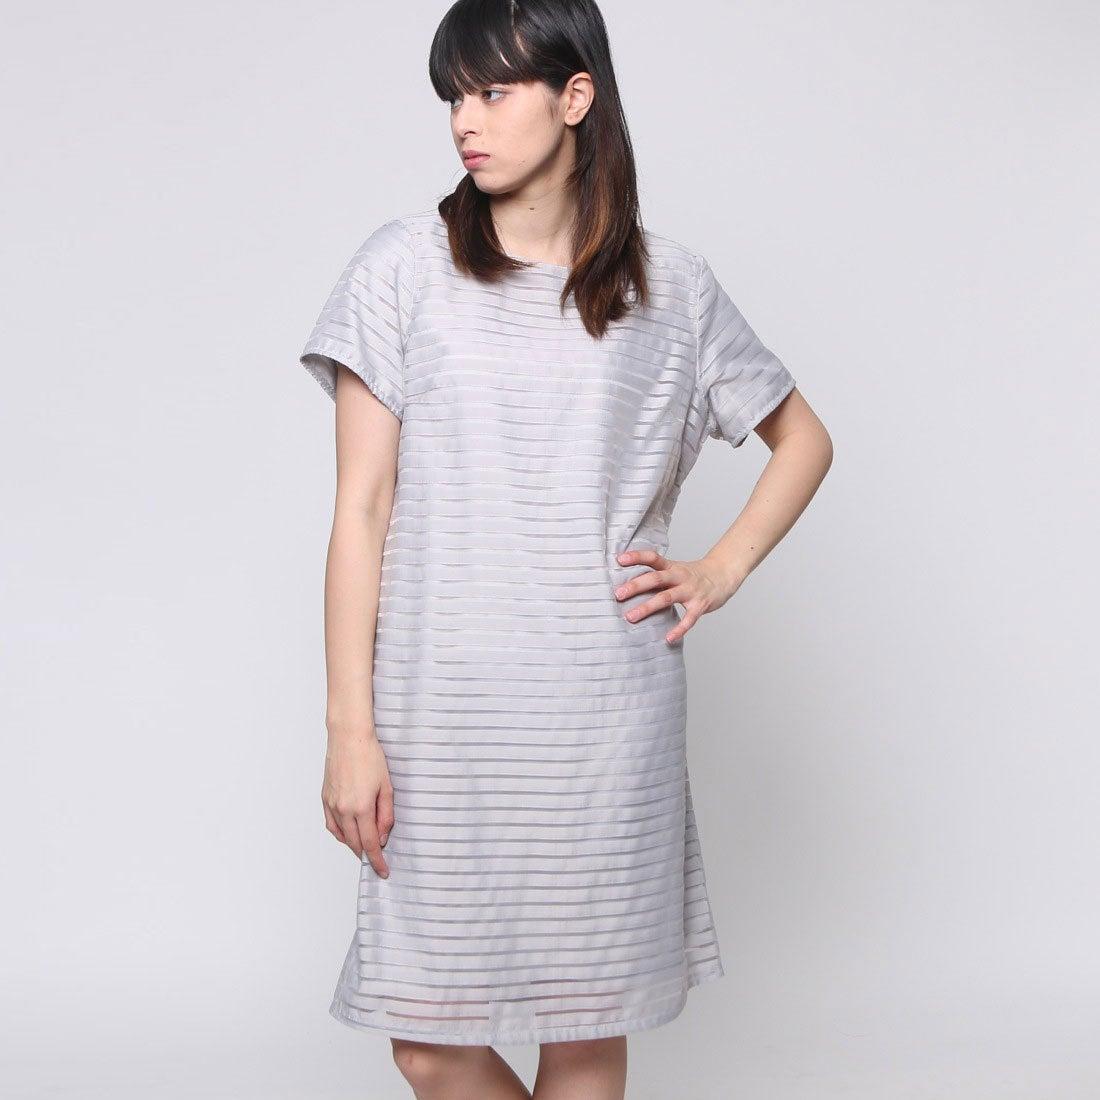 054ab180398b7 FINE (Rename) ファイン FINE 透かしボーダワンピース (グレー)-Rename.jp - 服の新しい売り方